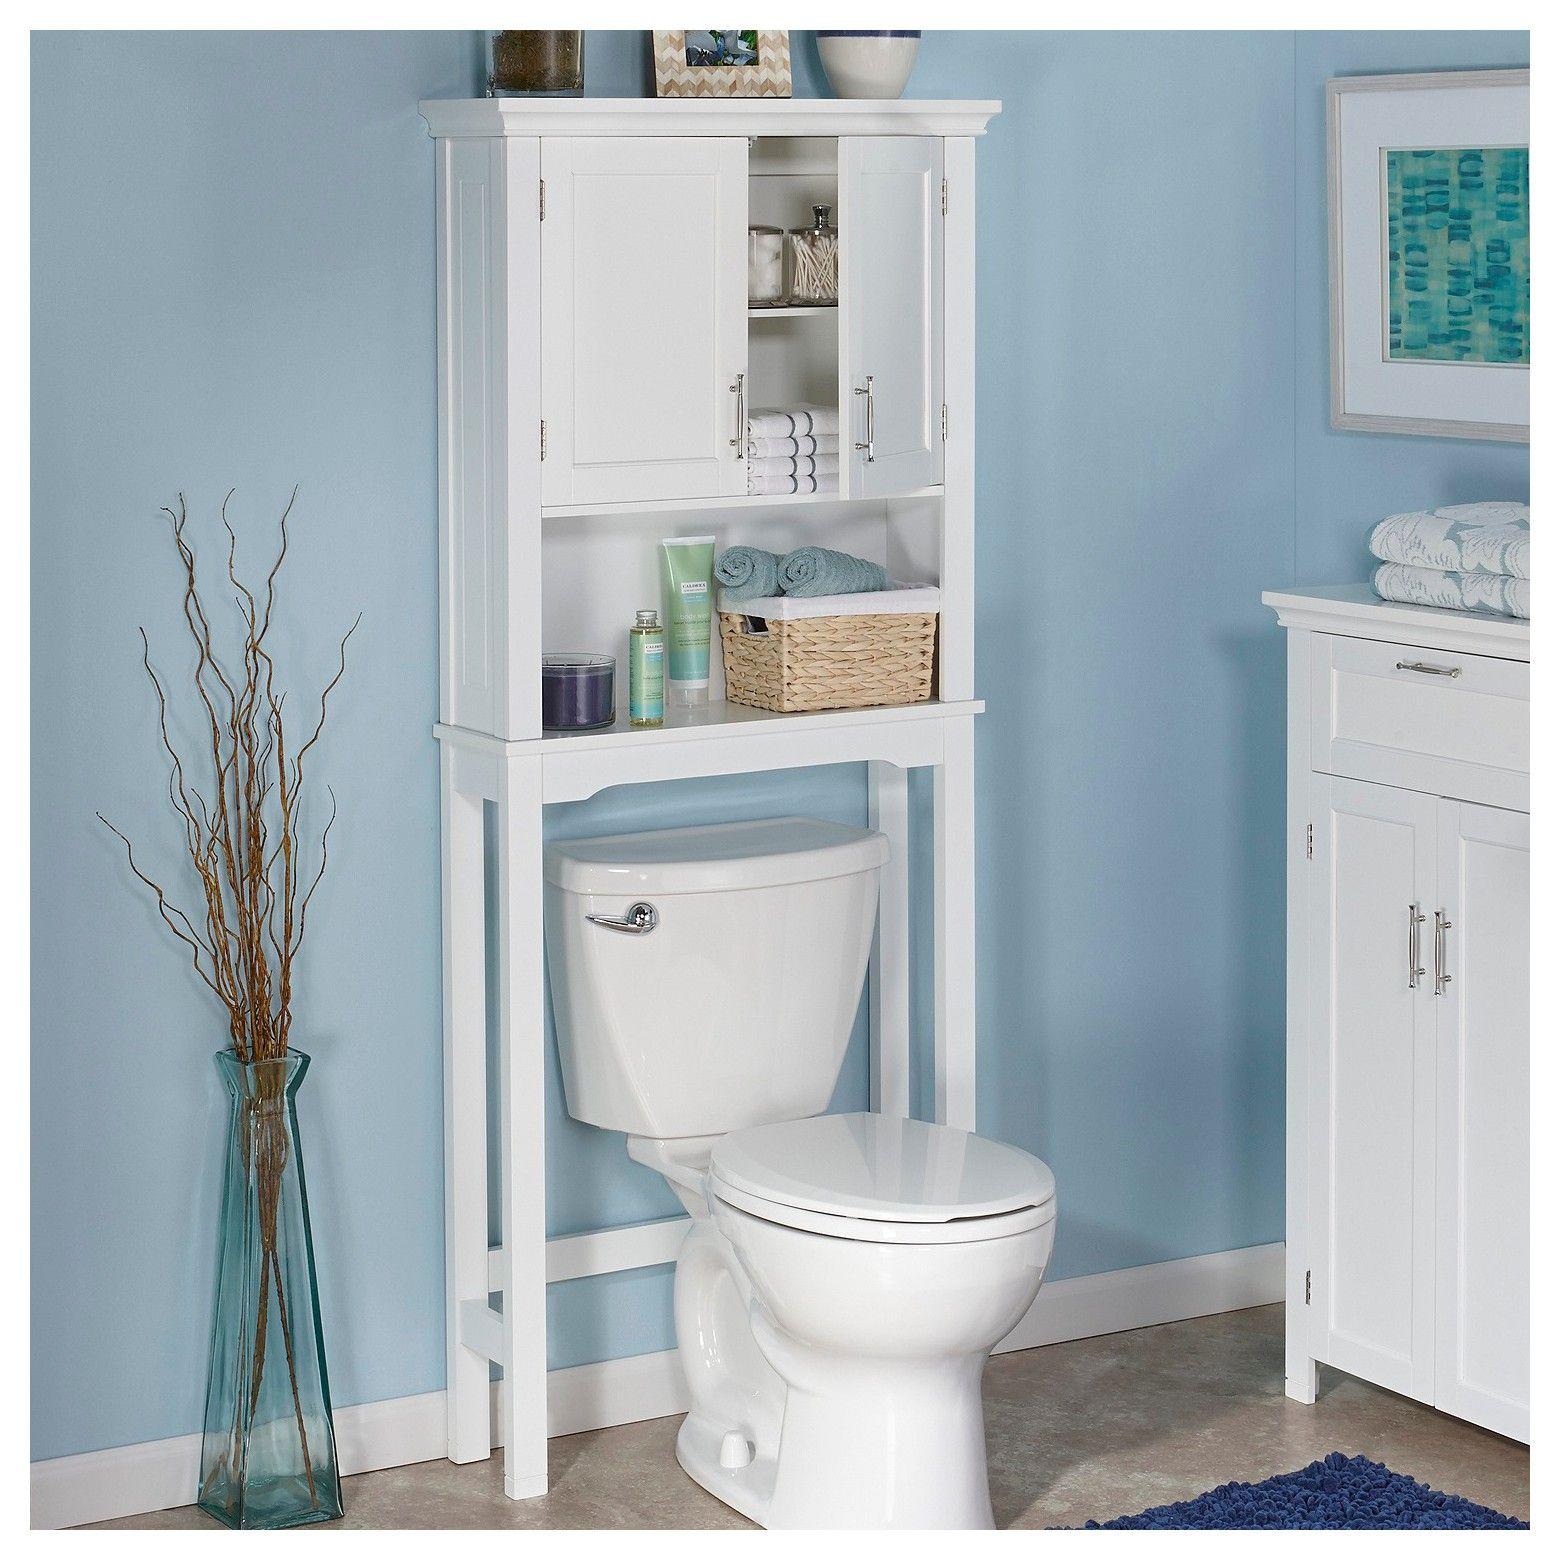 Tarket 113 Over The Toilet Cabinet Toilet Storage Storage Cabinet Shelves